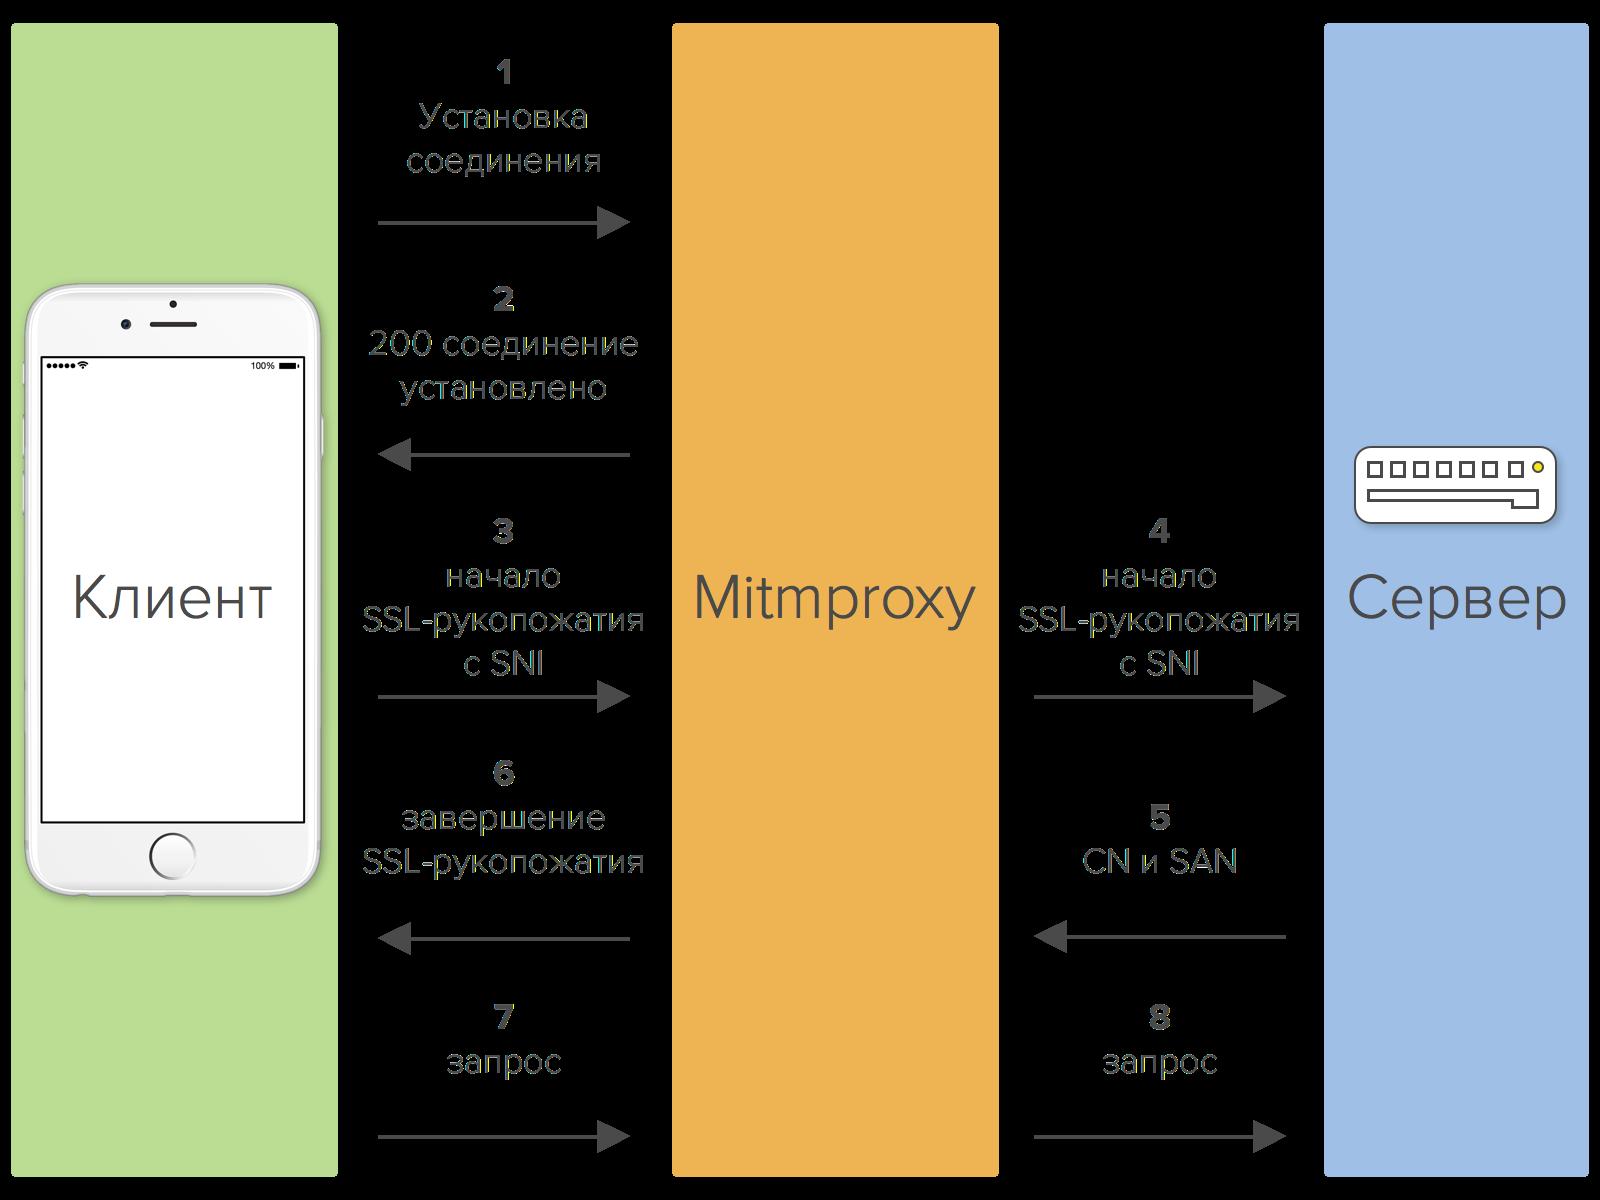 mitmproxy